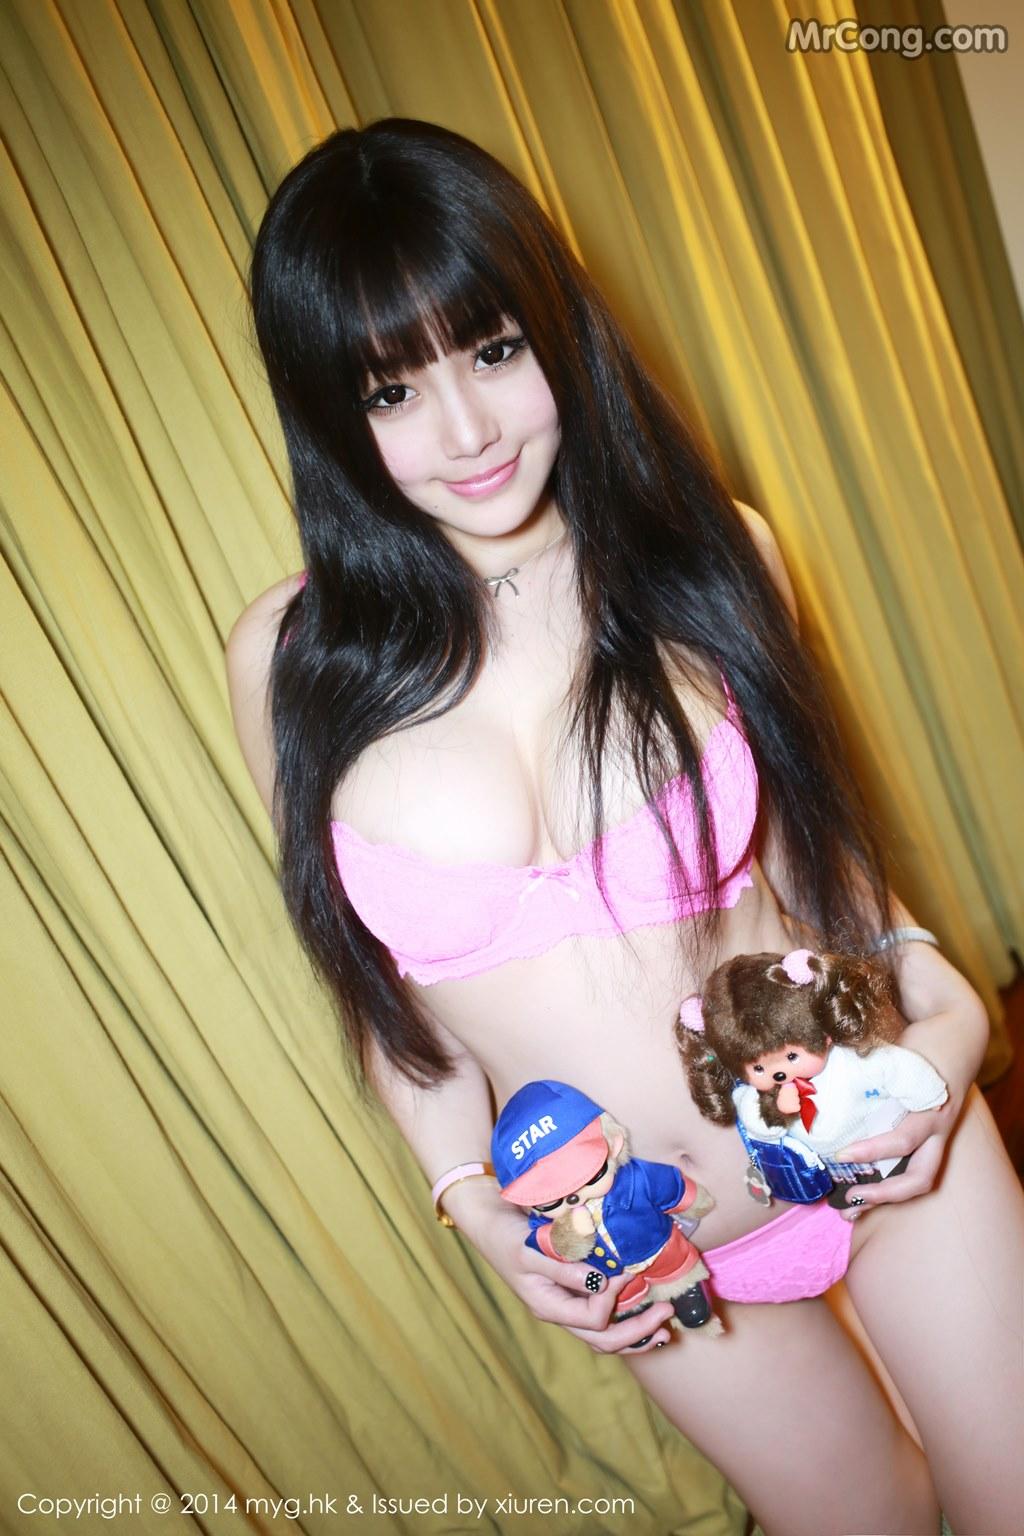 MyGirl Vol.013: Model Barbie Ke Er (Barbie可儿) (159P)